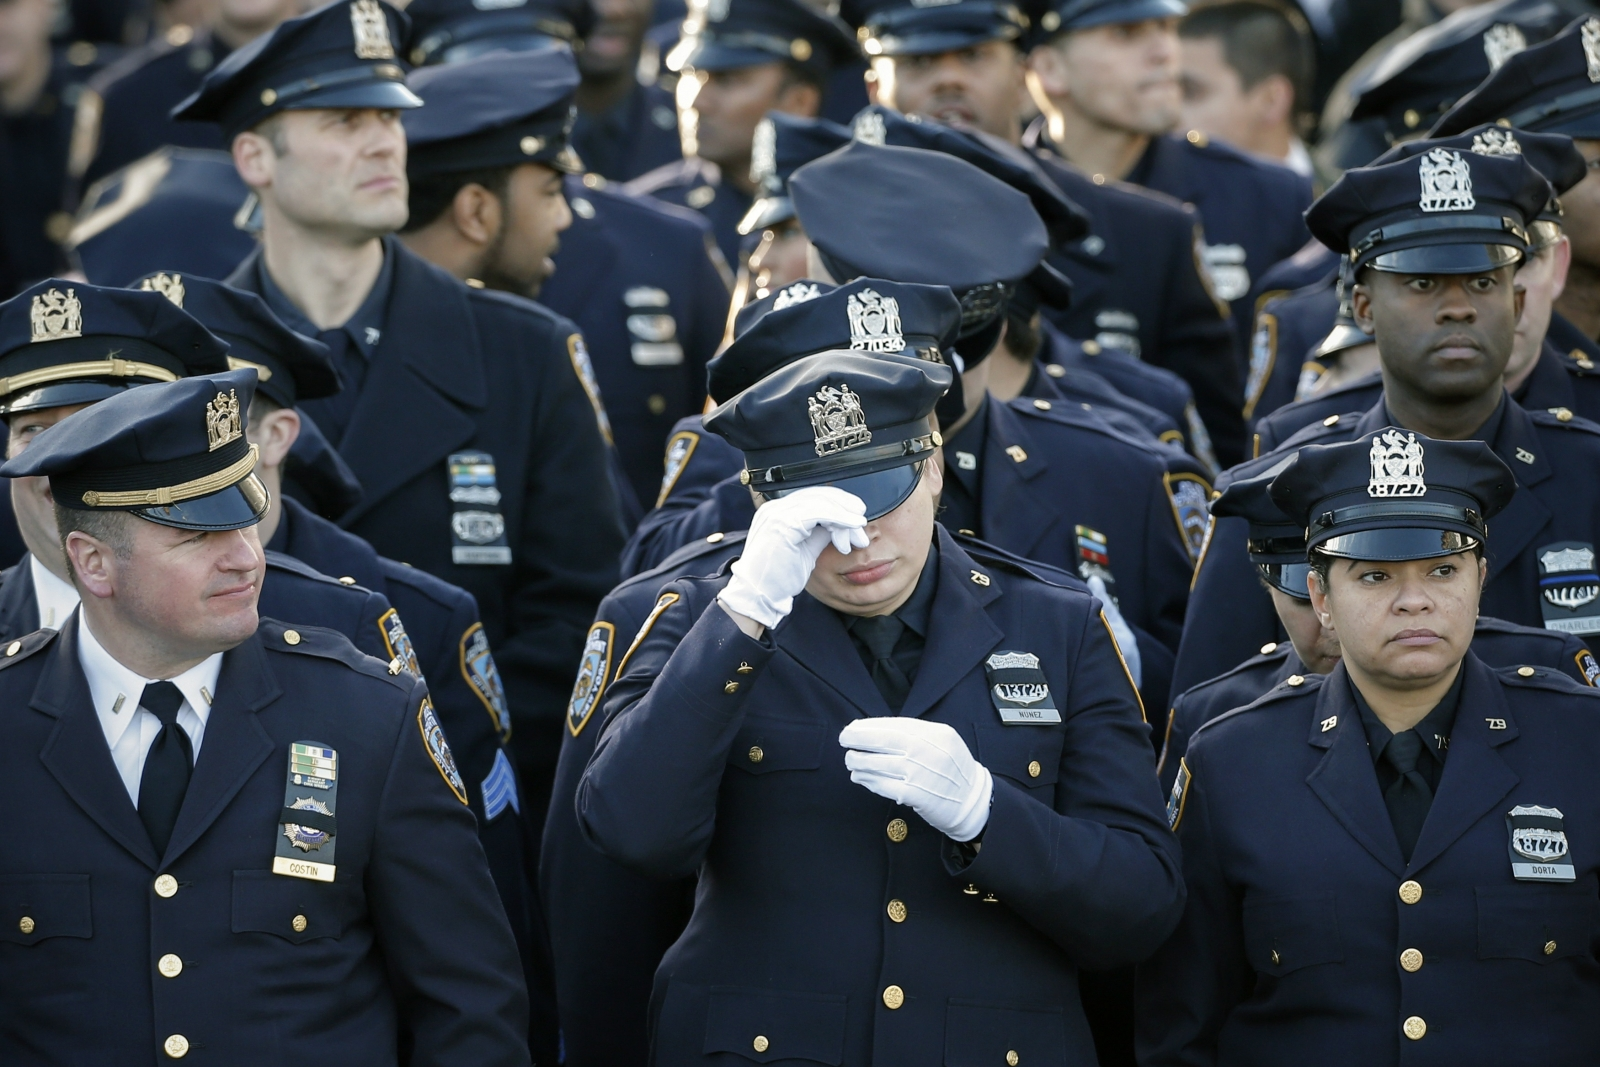 Policemen line-up near the Christ Tabernacle Church